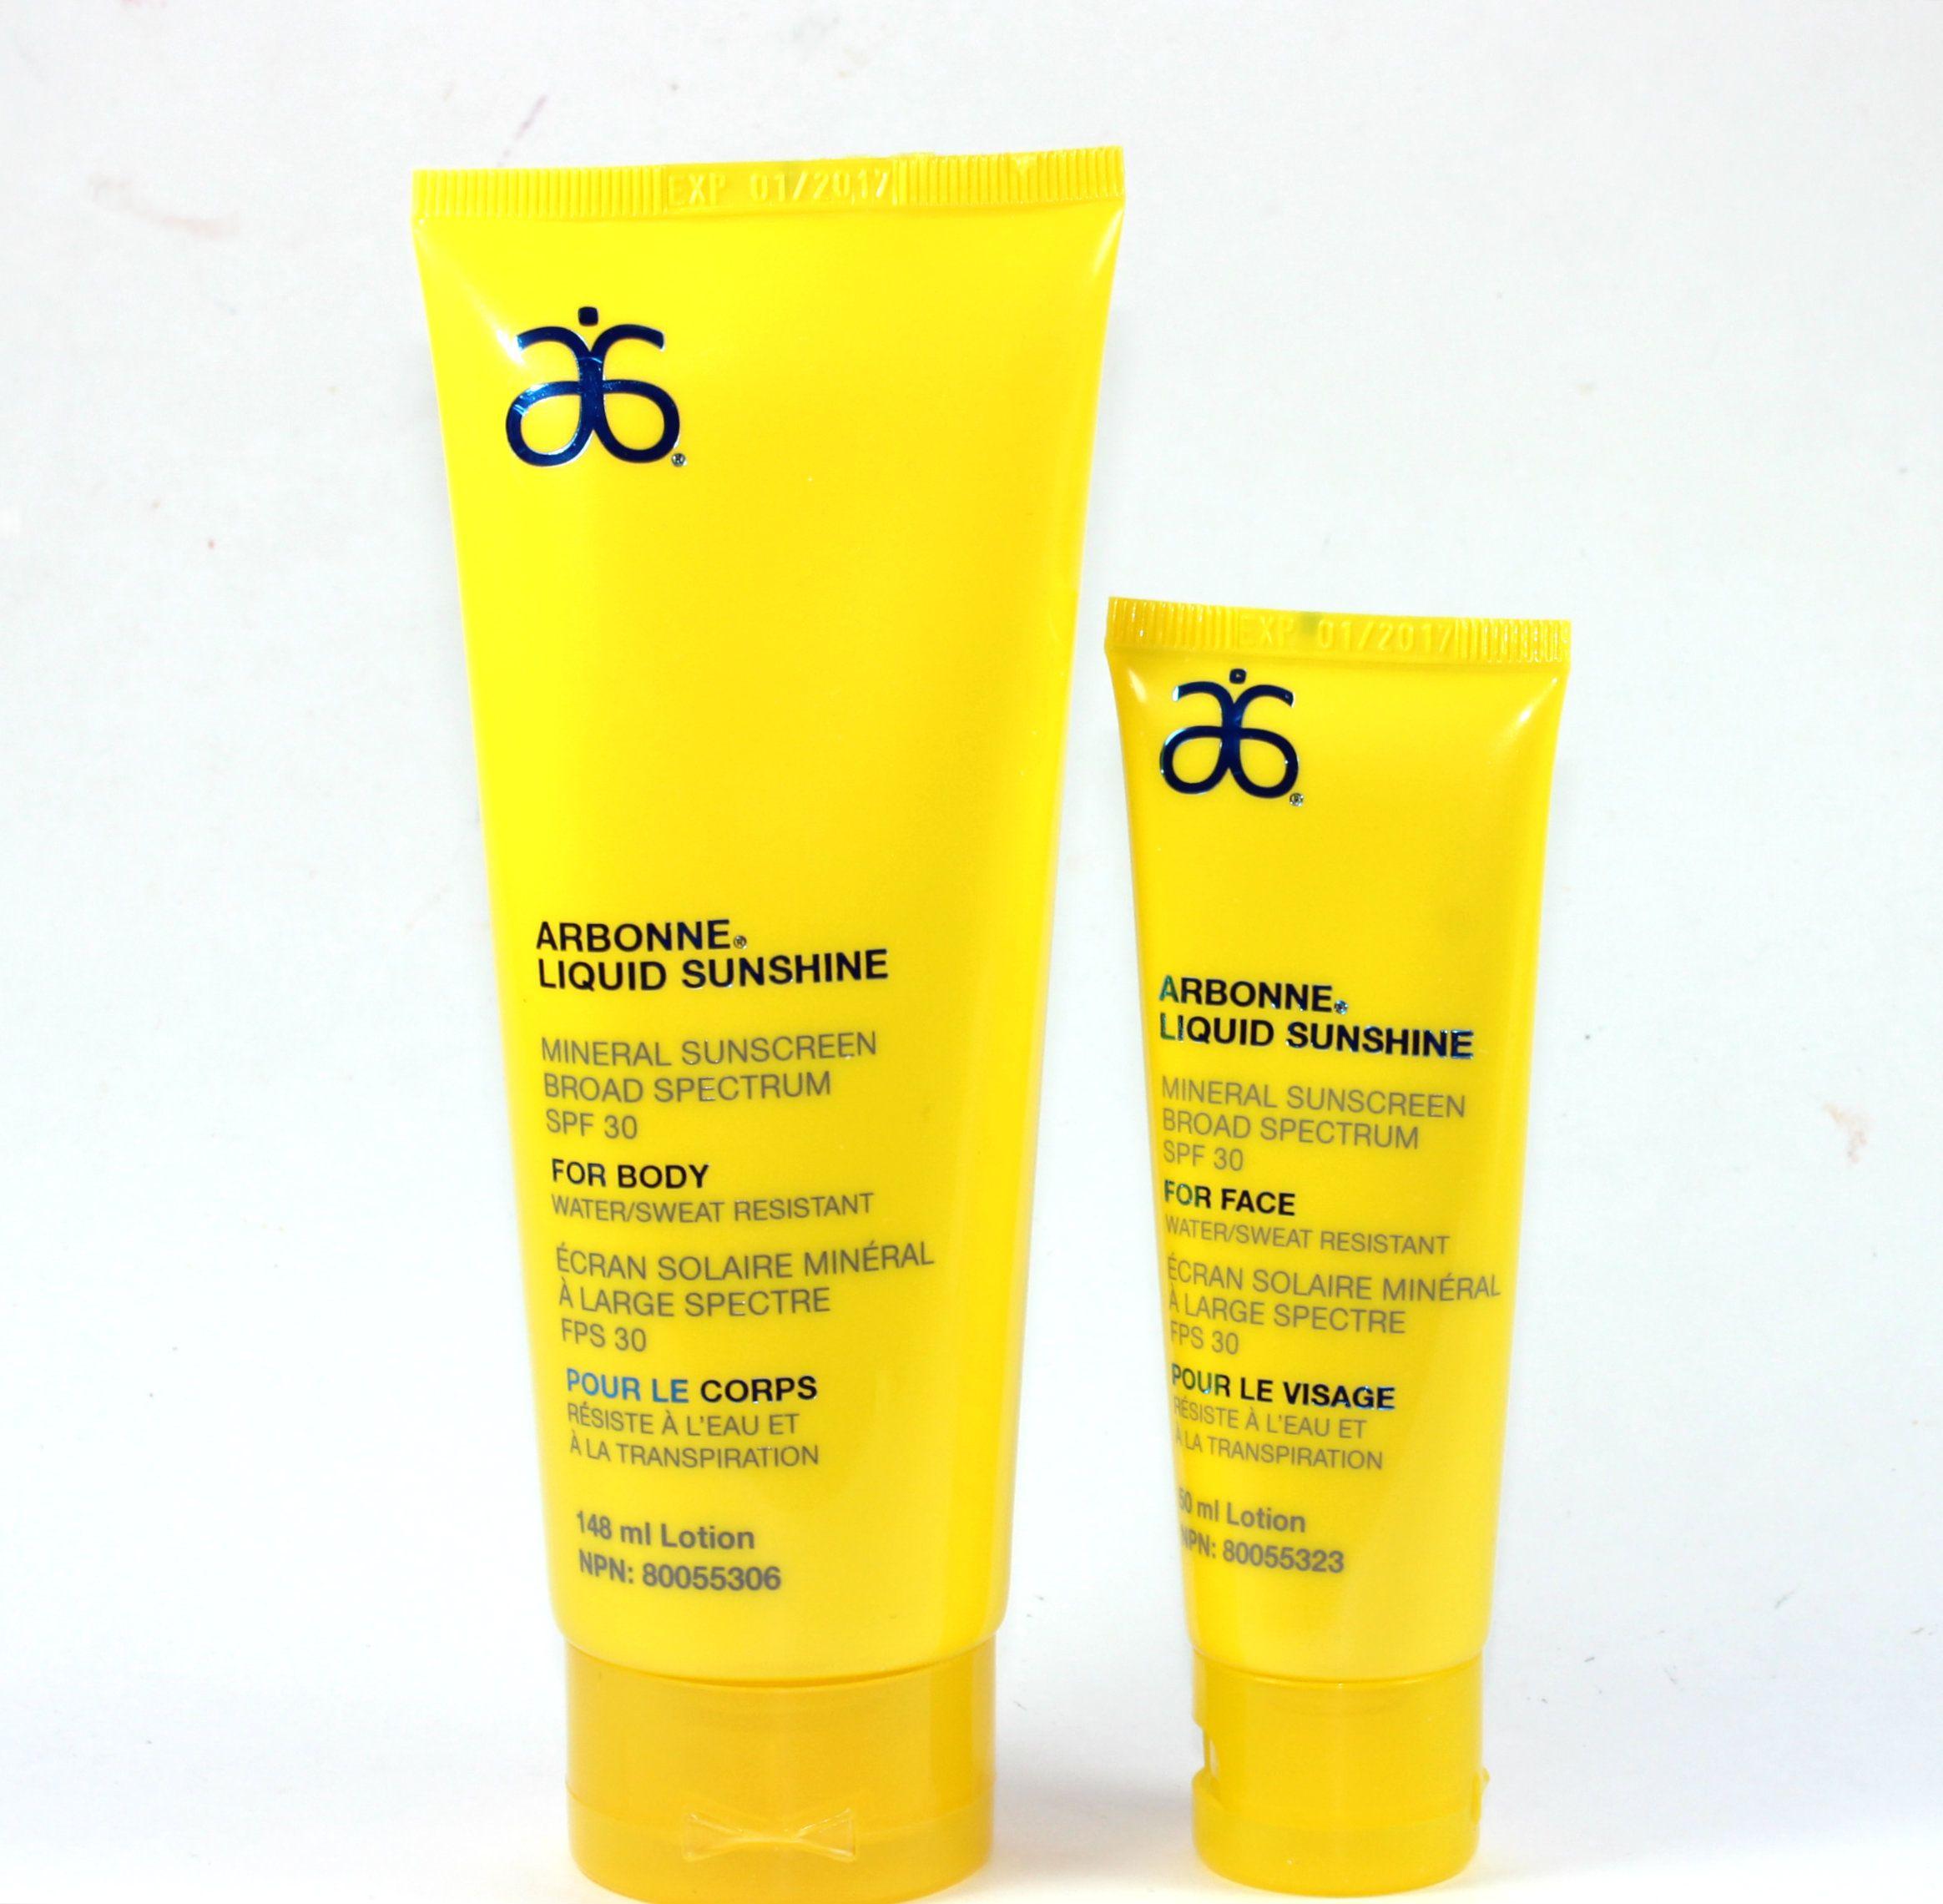 Arbonne Liquid Sunshine Mineral Sunscreen SPF 30 Face